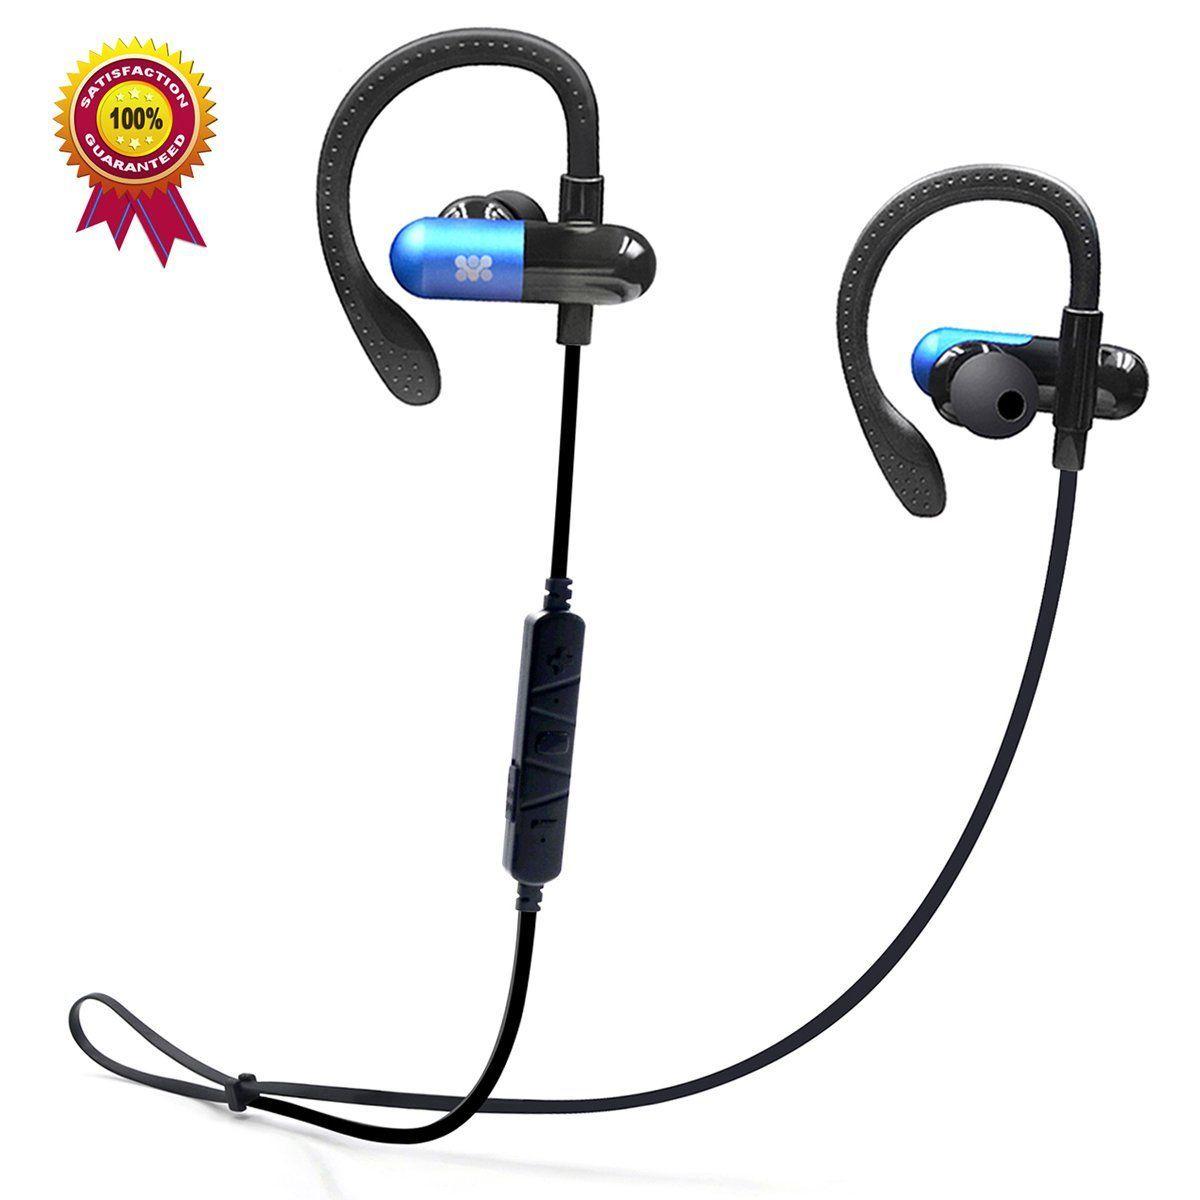 Bluetooth Headphones SOWAK Wireless Sports Earphones Noise